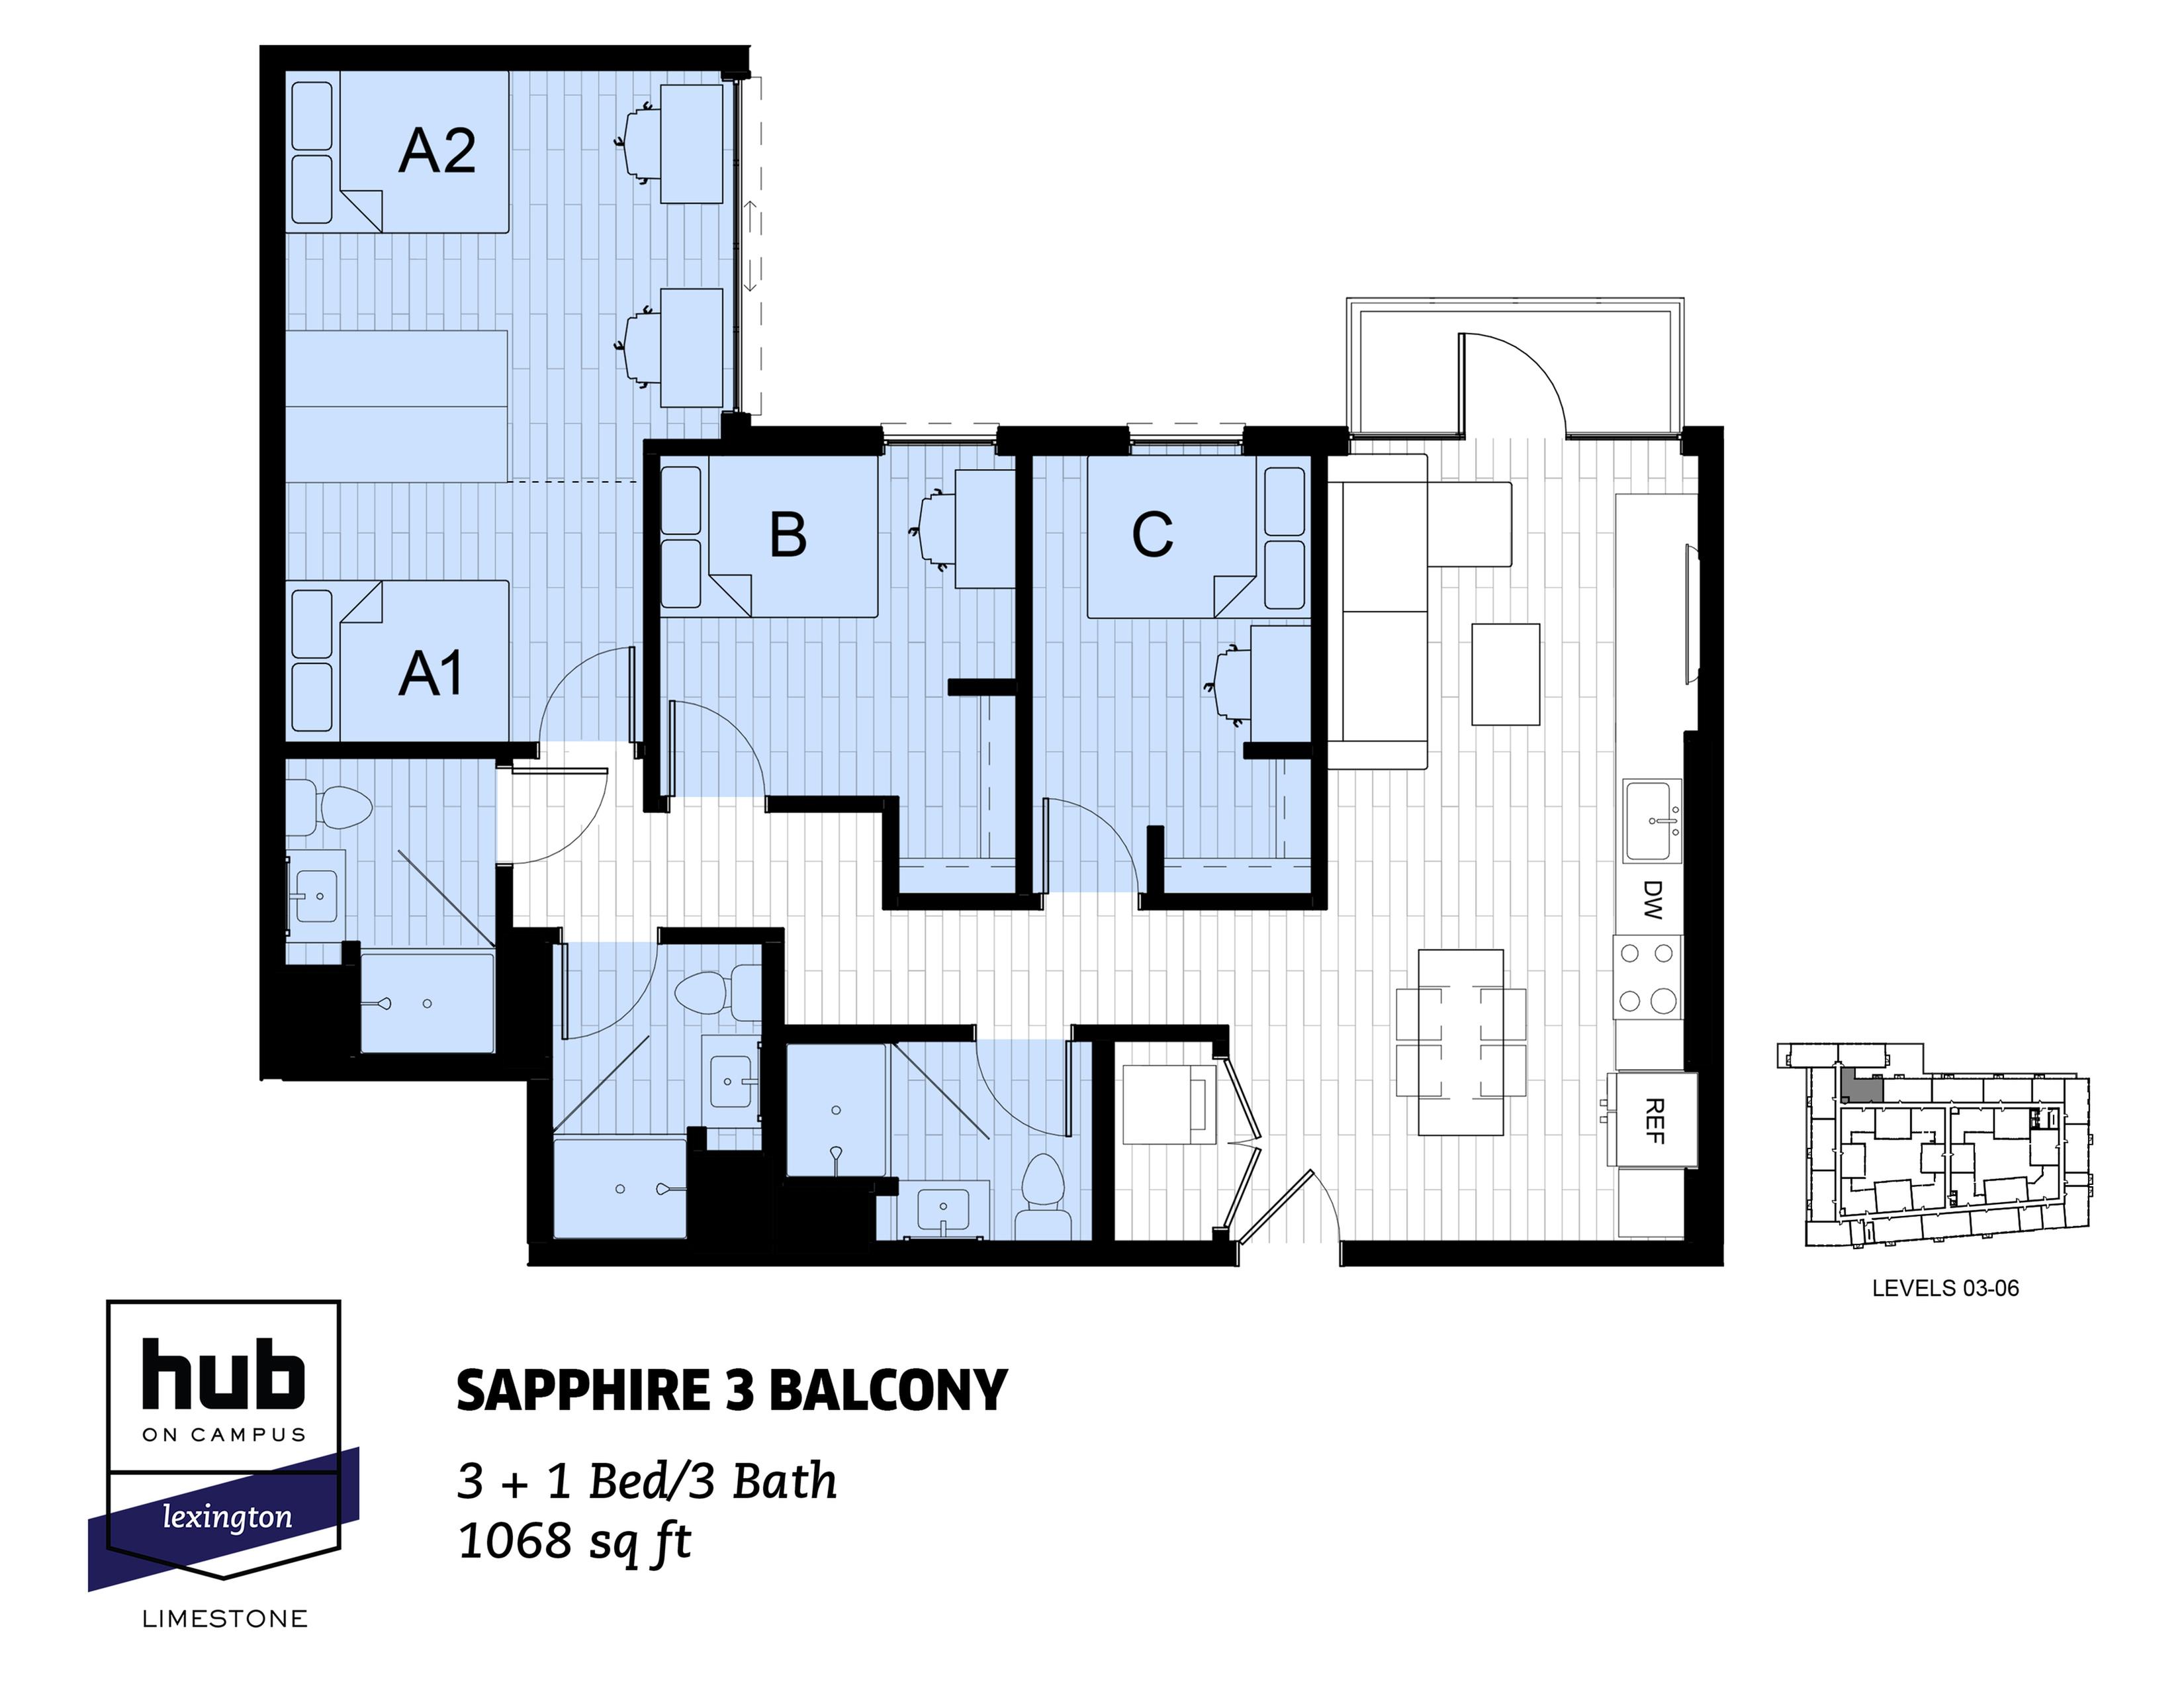 Sapphire 3 Balcony